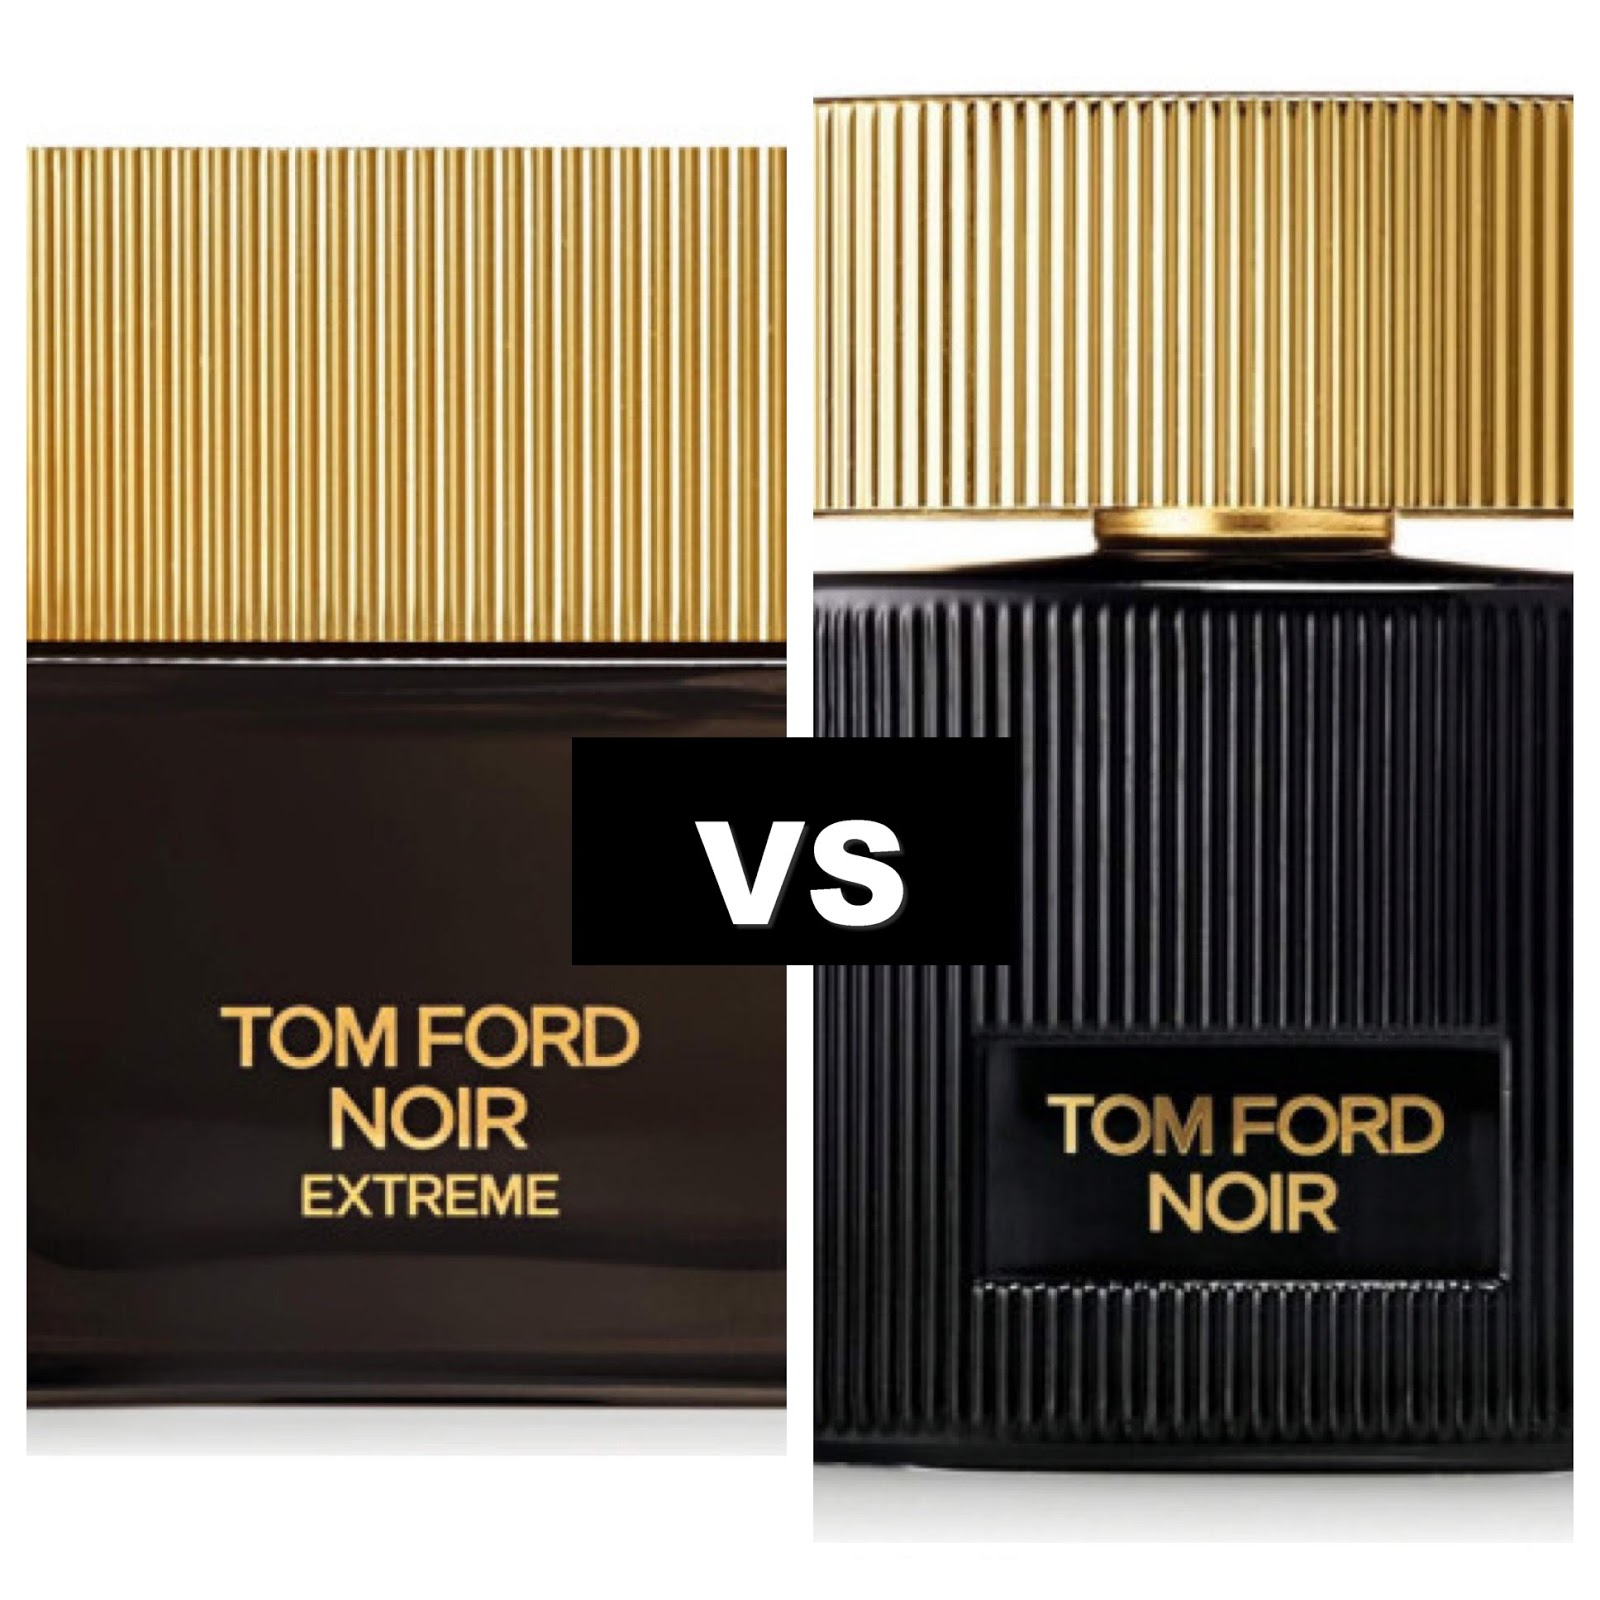 Brooklyn Fragrance Lover Tom Ford Noir Extreme VS Noir Pour Femme